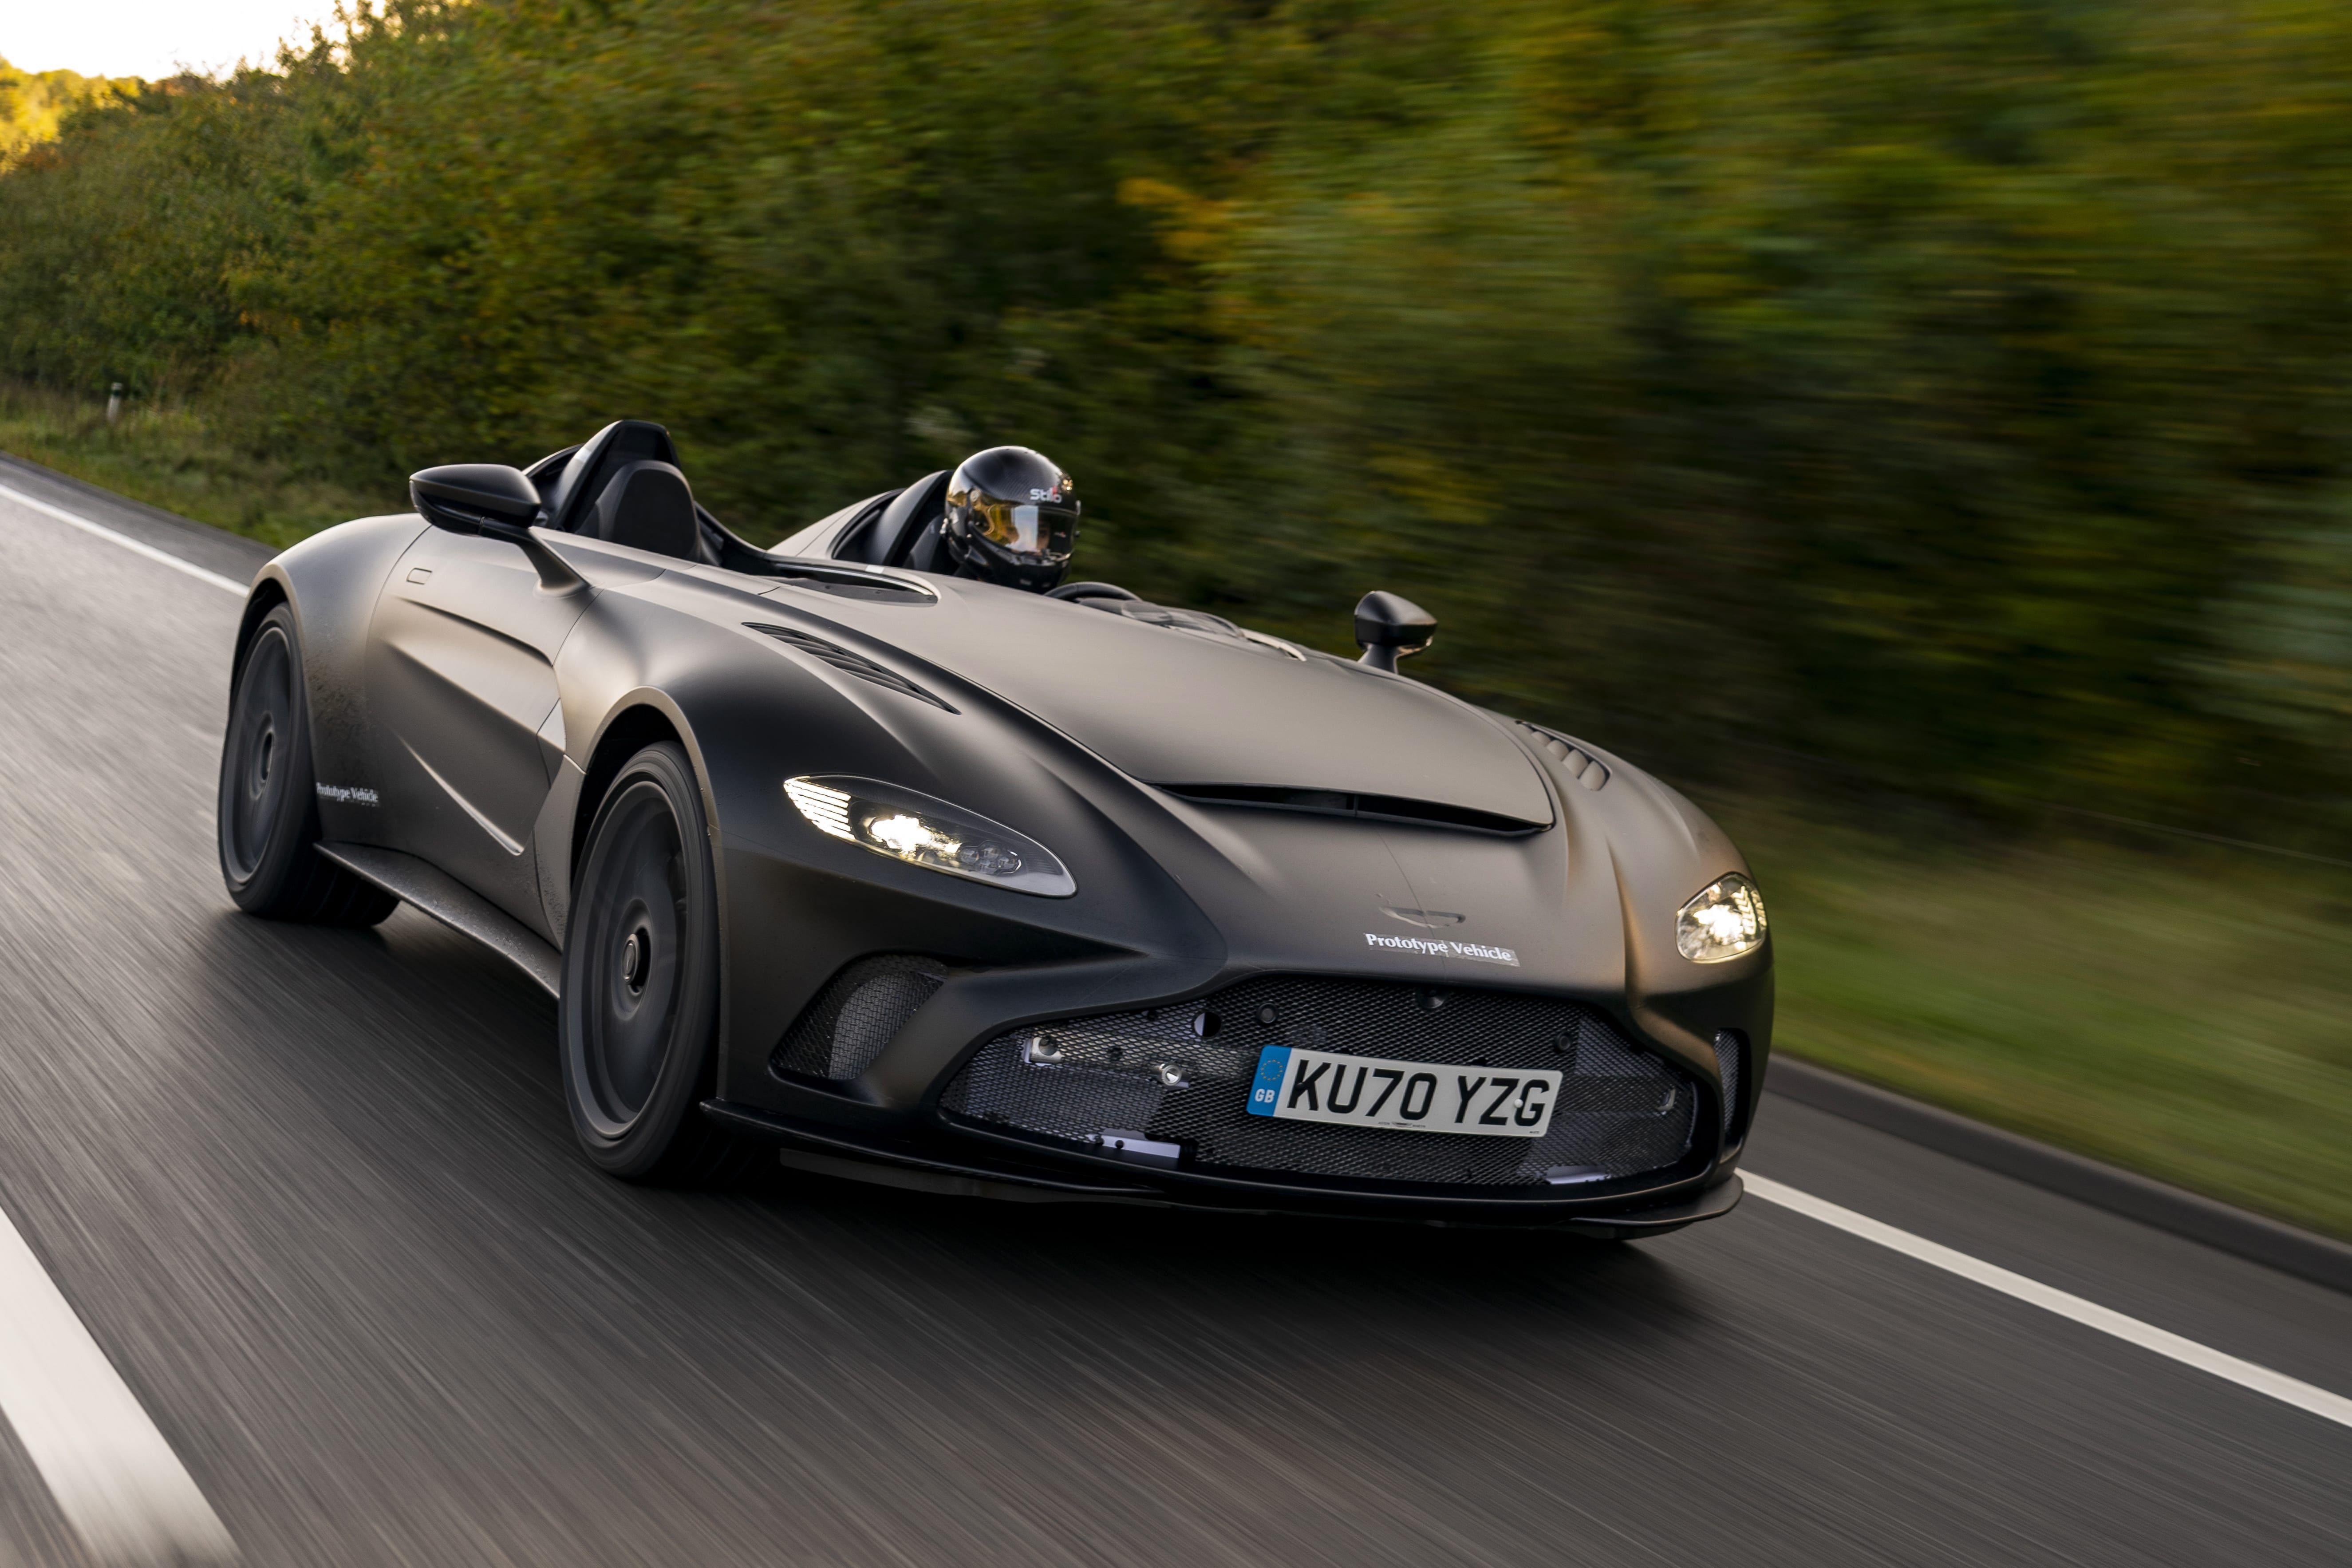 New Photos Show Aston Martin V12 Speedster Haulin British Buns